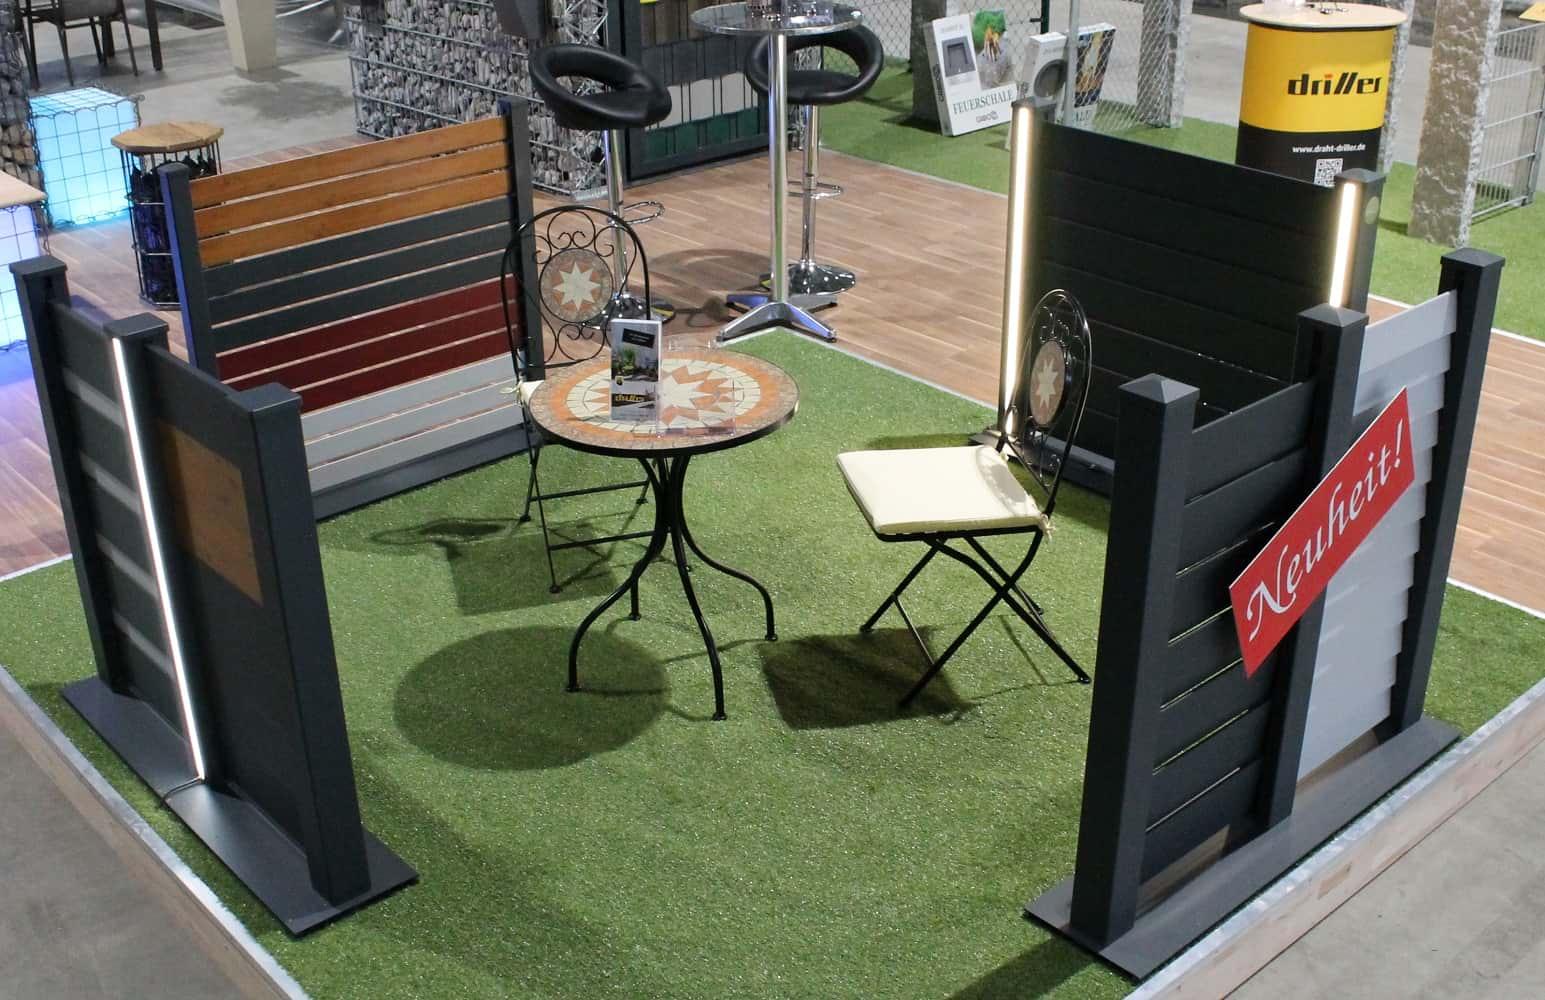 atemberaubend wird aluminium rost draht fotos der schaltplan. Black Bedroom Furniture Sets. Home Design Ideas